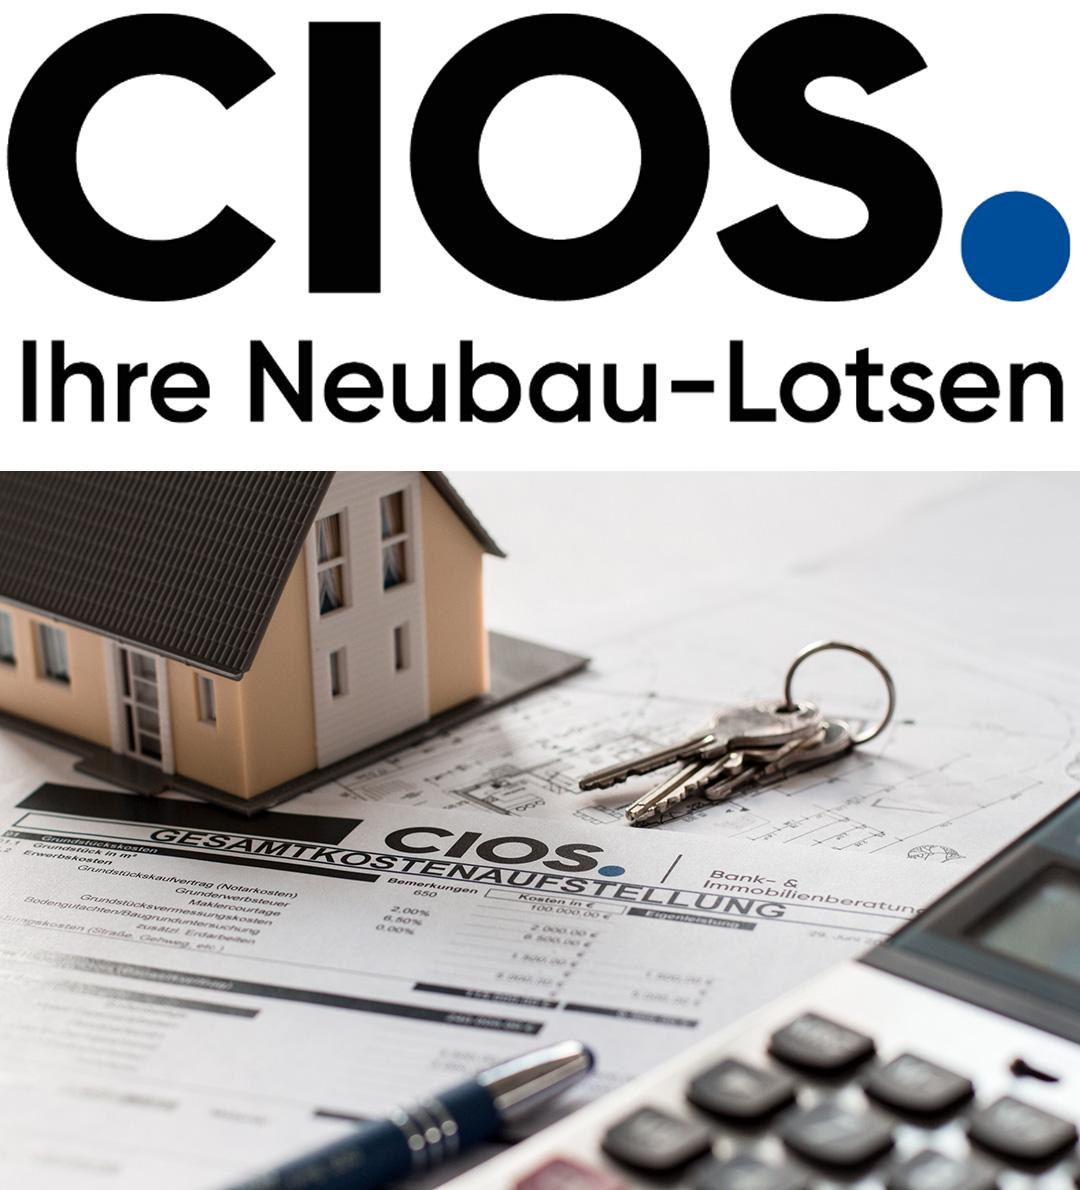 Abbildung Logo CIOS Ihre Neubau Lotsen